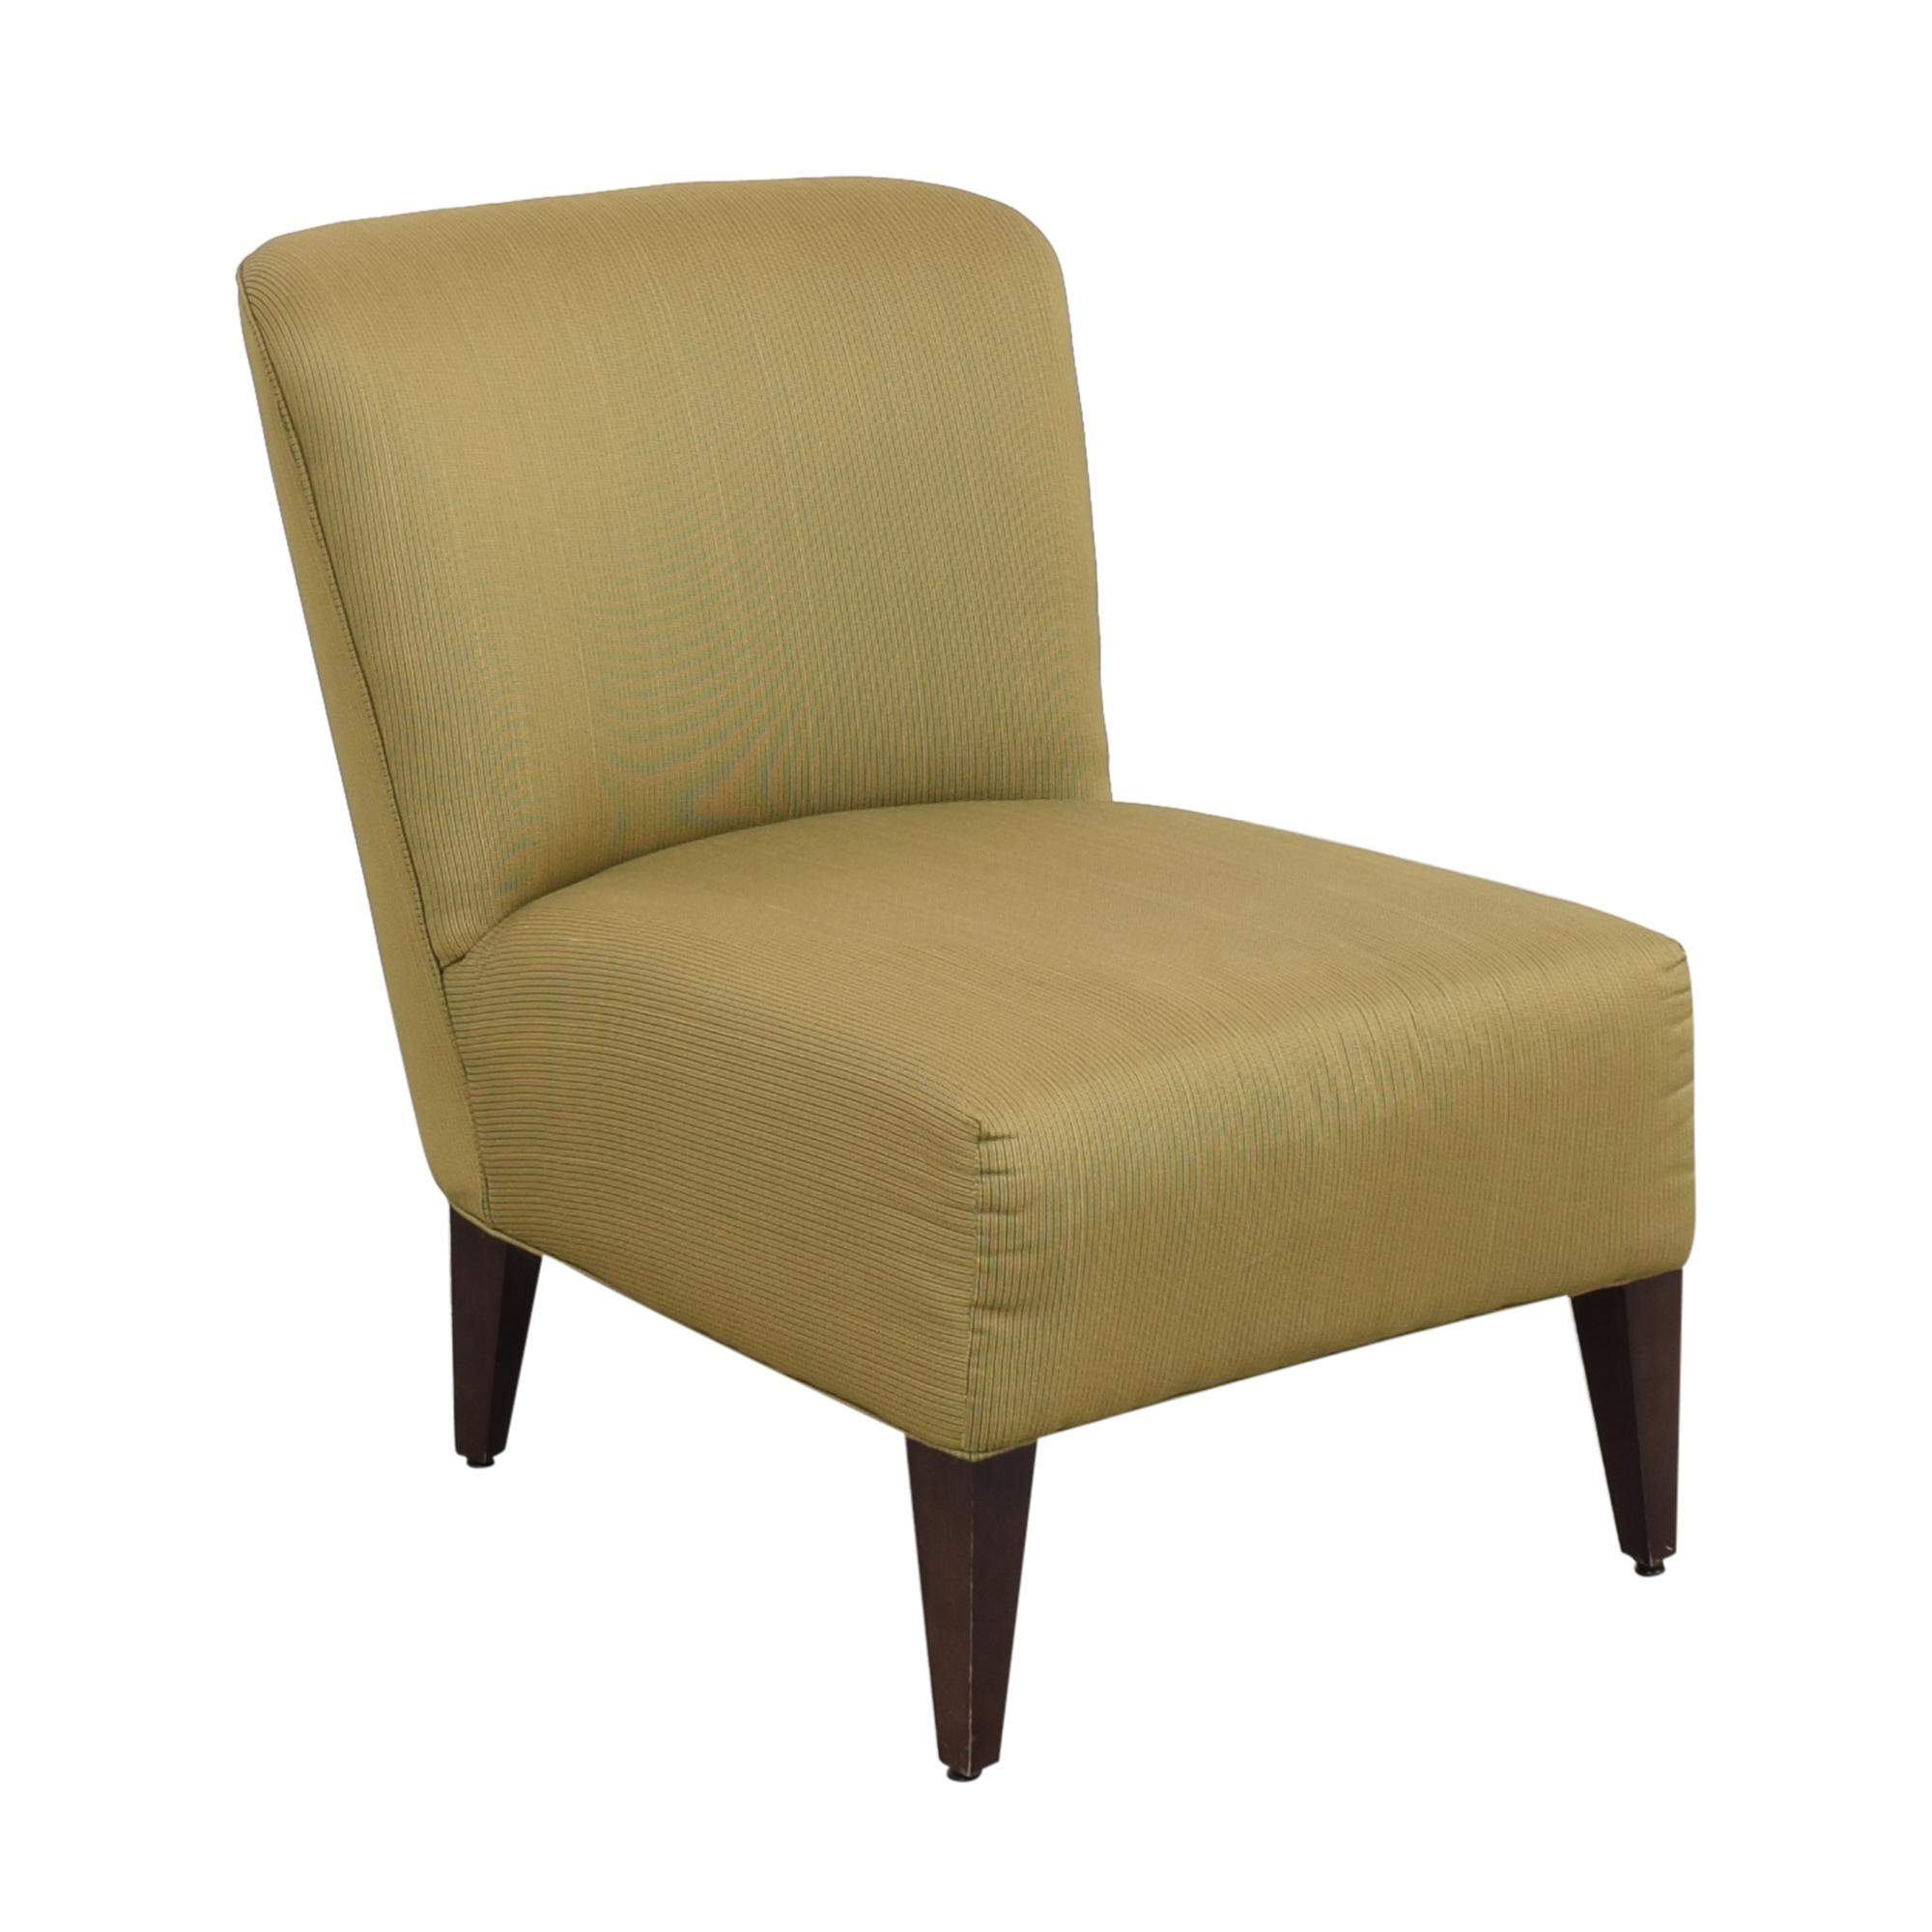 buy Restoration Hardware Slipper Style Accent Chair Restoration Hardware Chairs